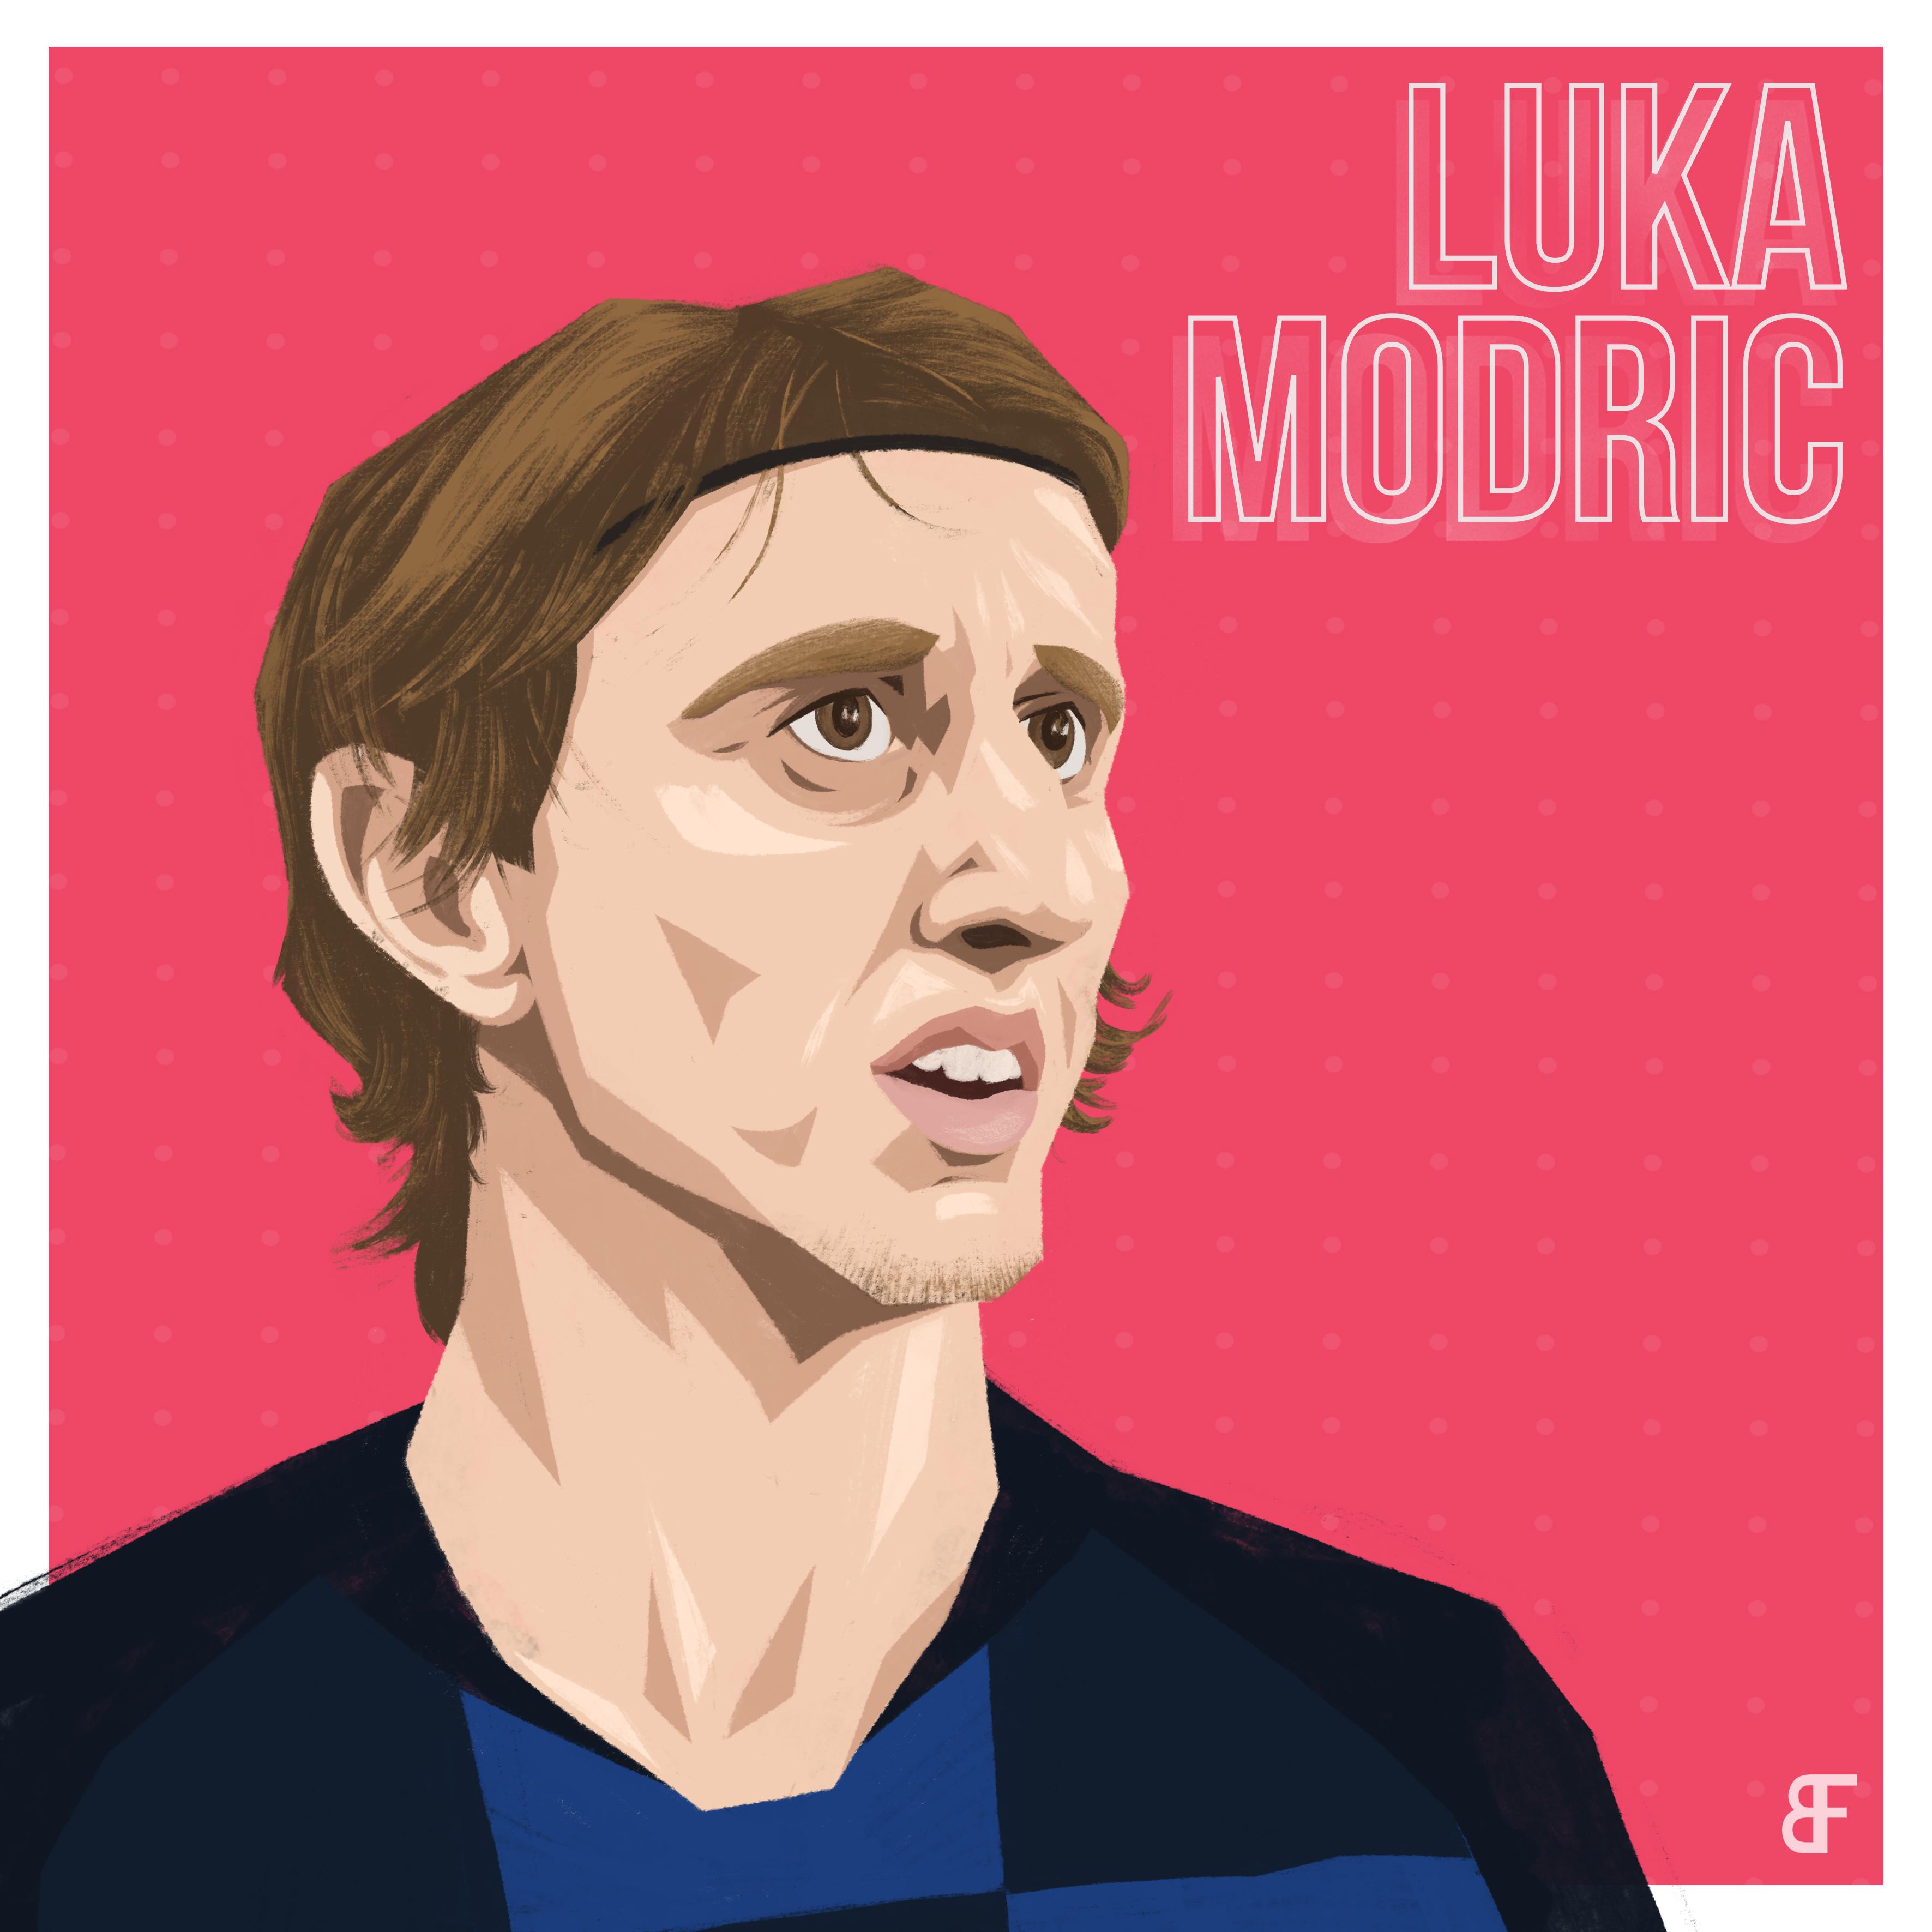 Luka modric portrait